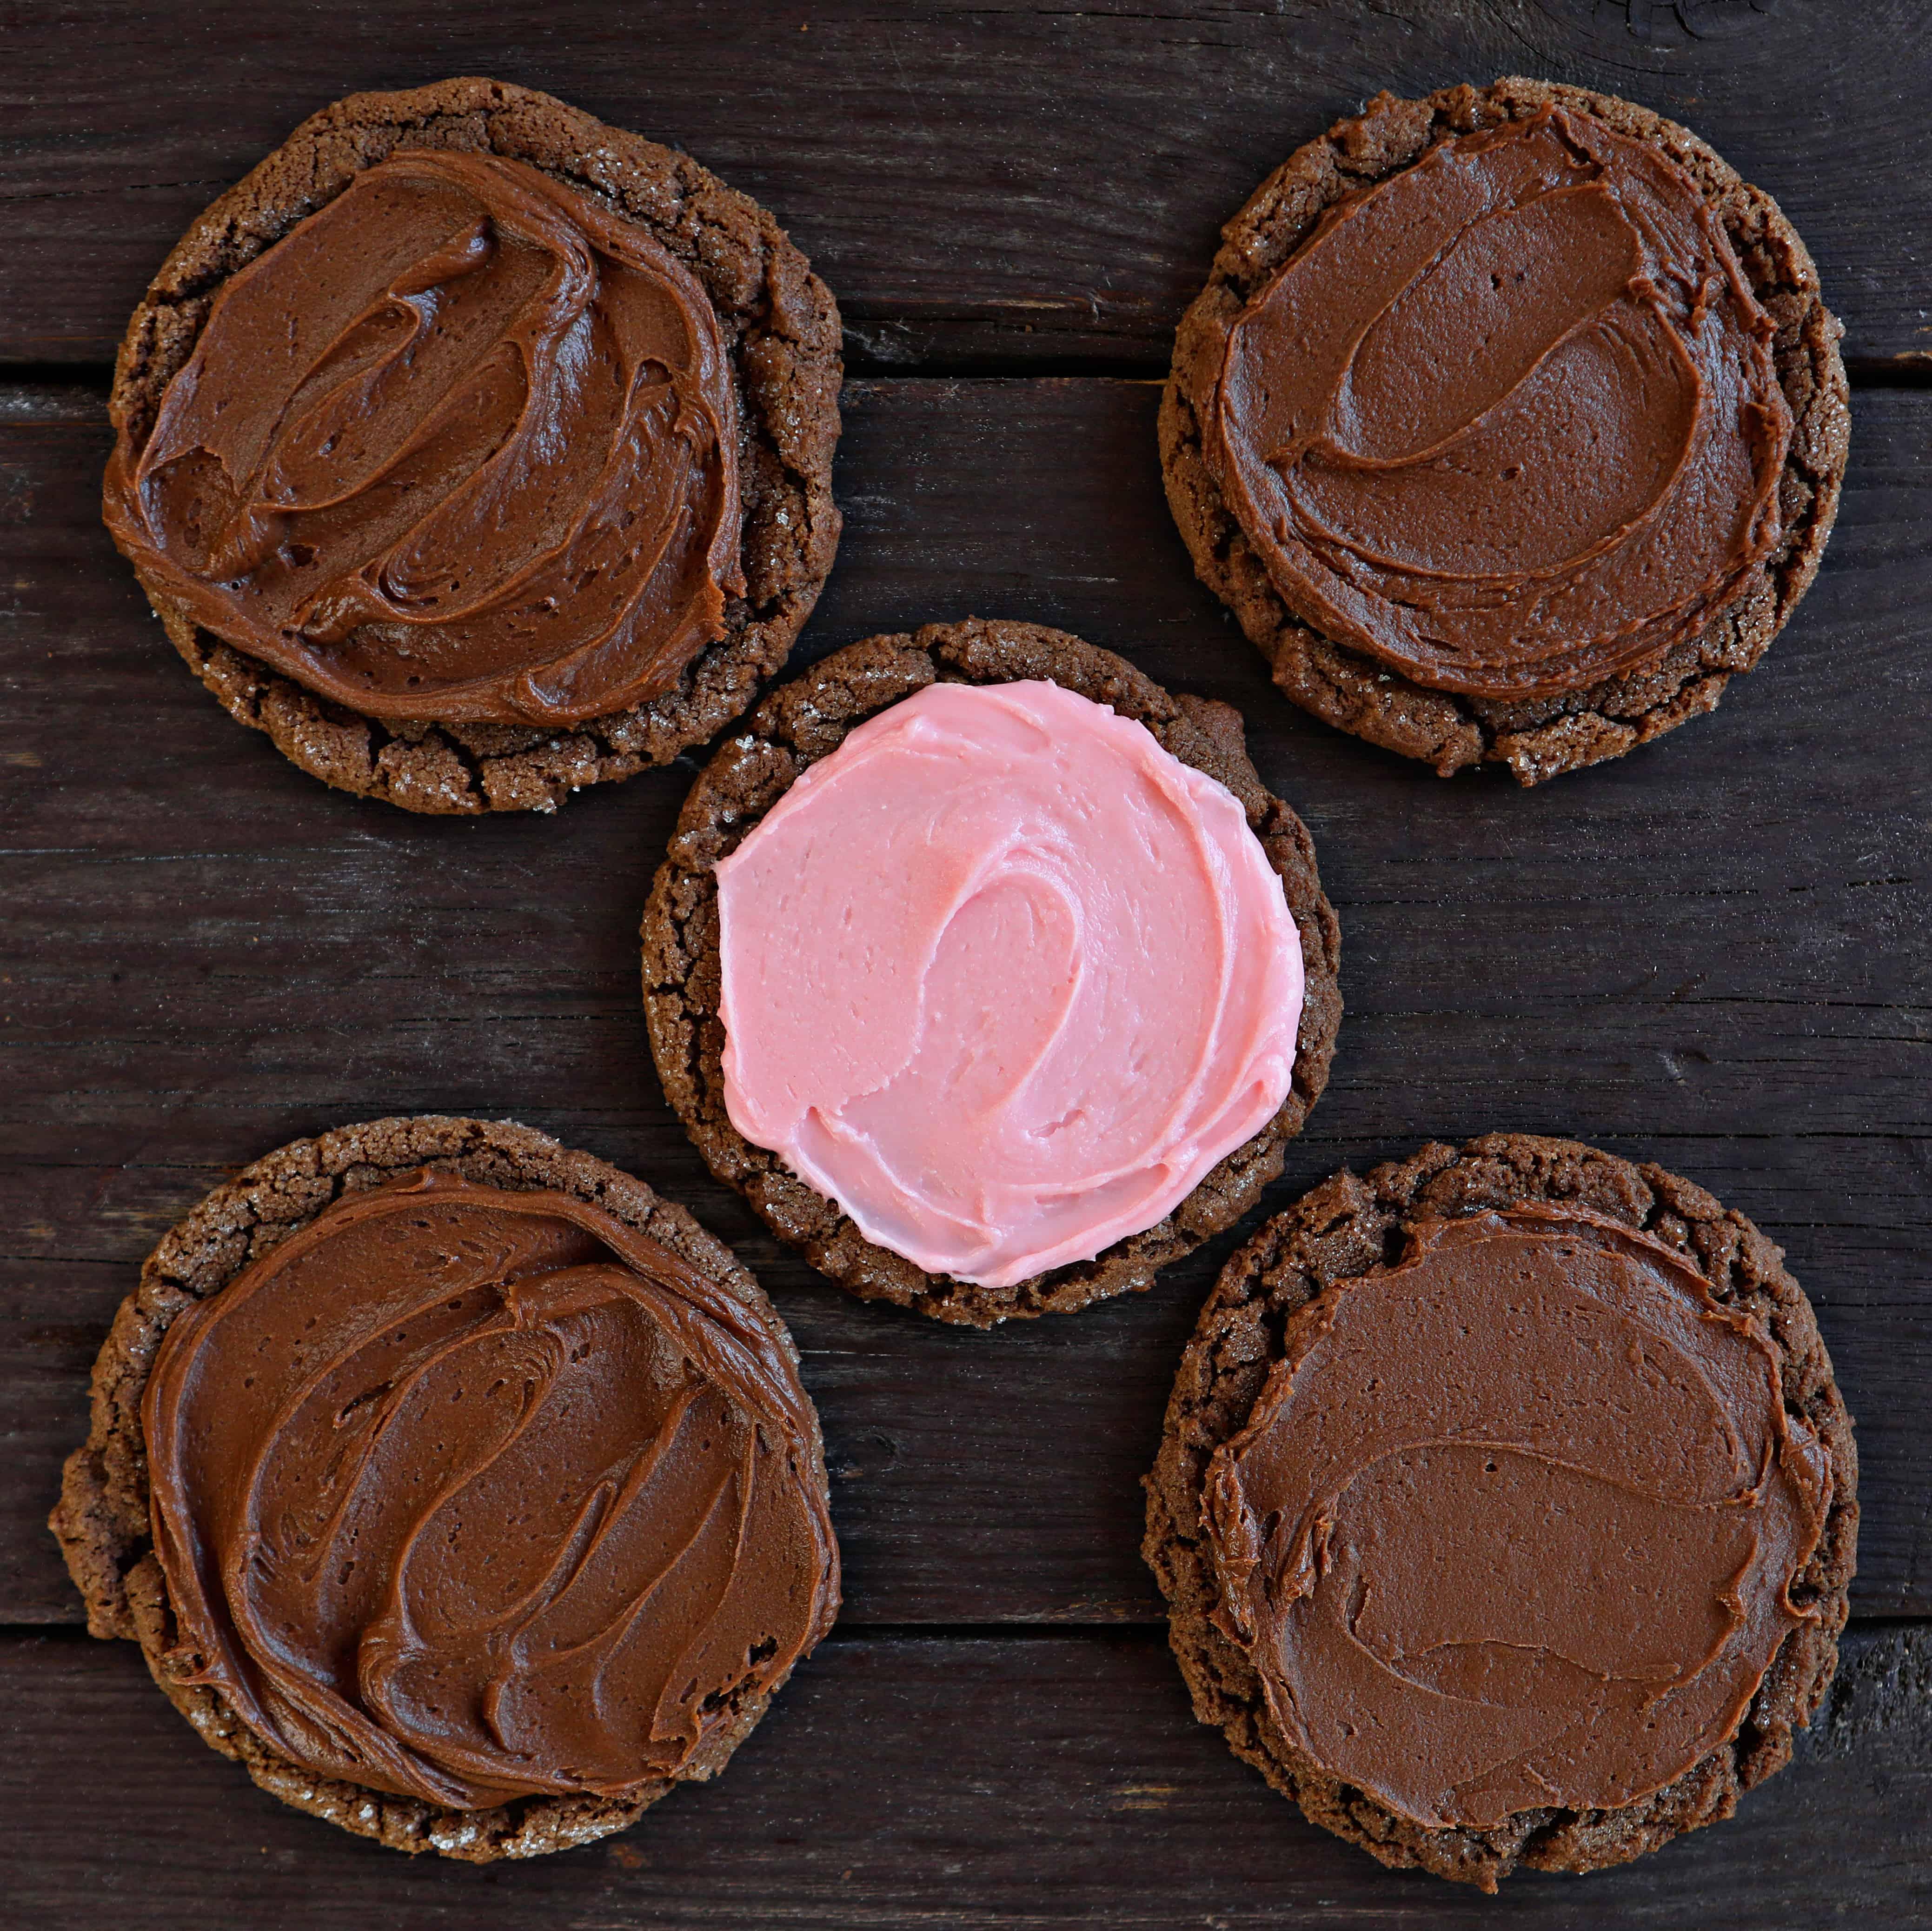 Dirty Chocolate Cookies